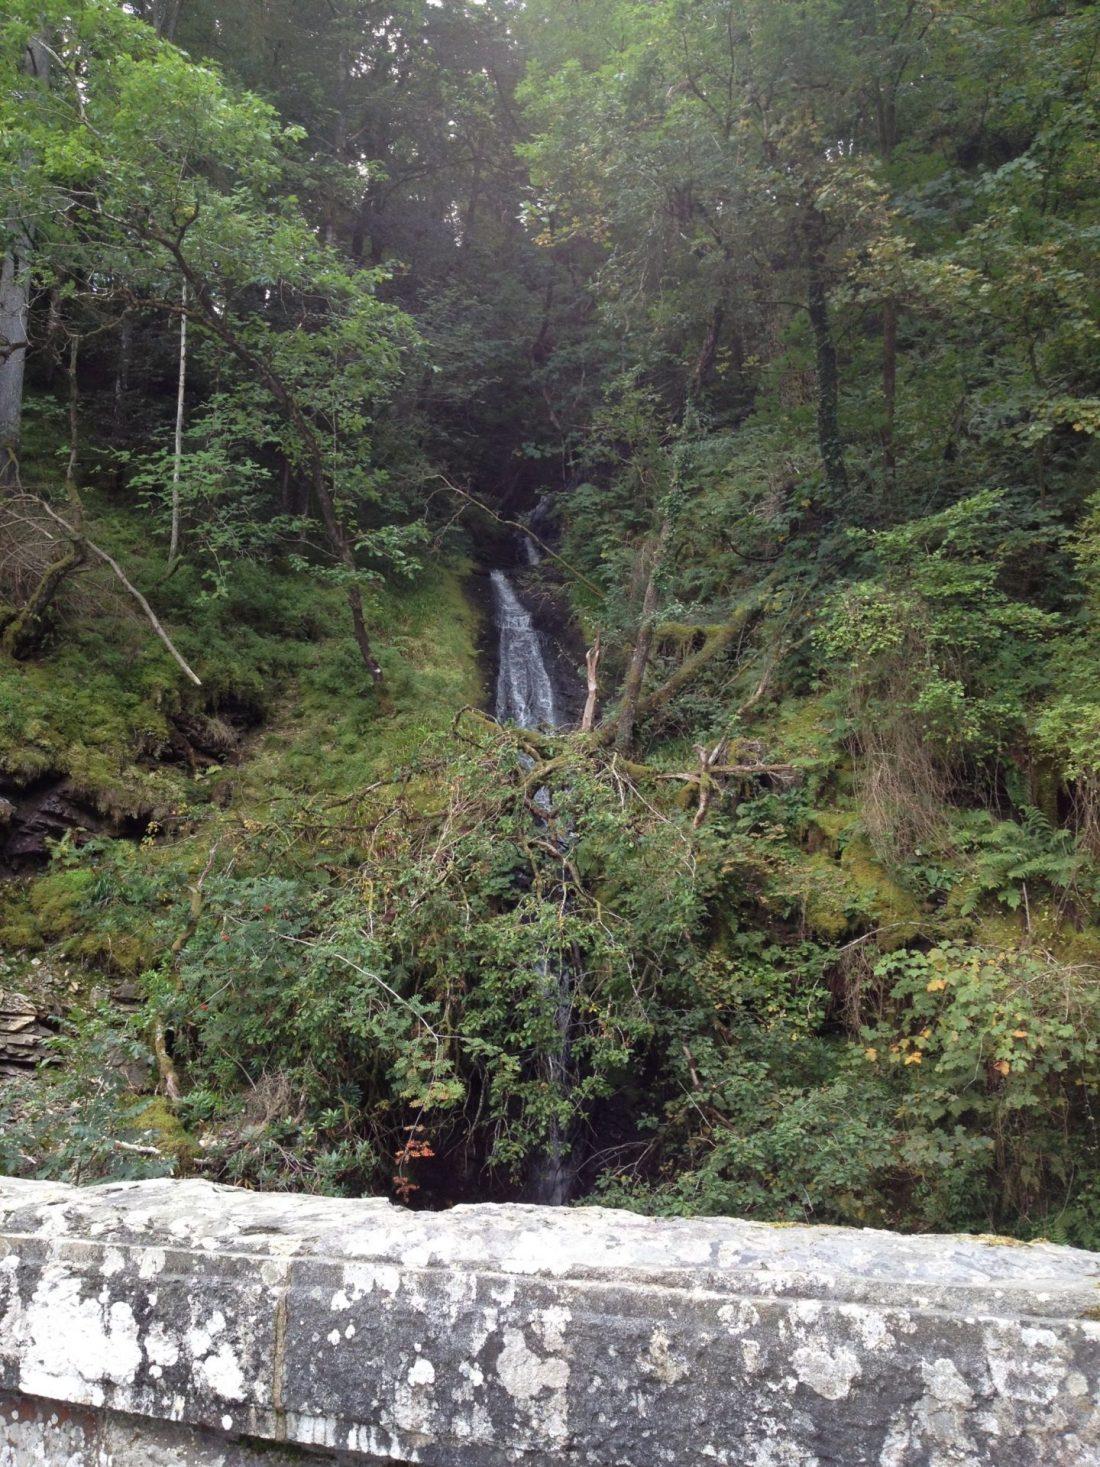 A waterfall at Lake Vyrnwy, Wales